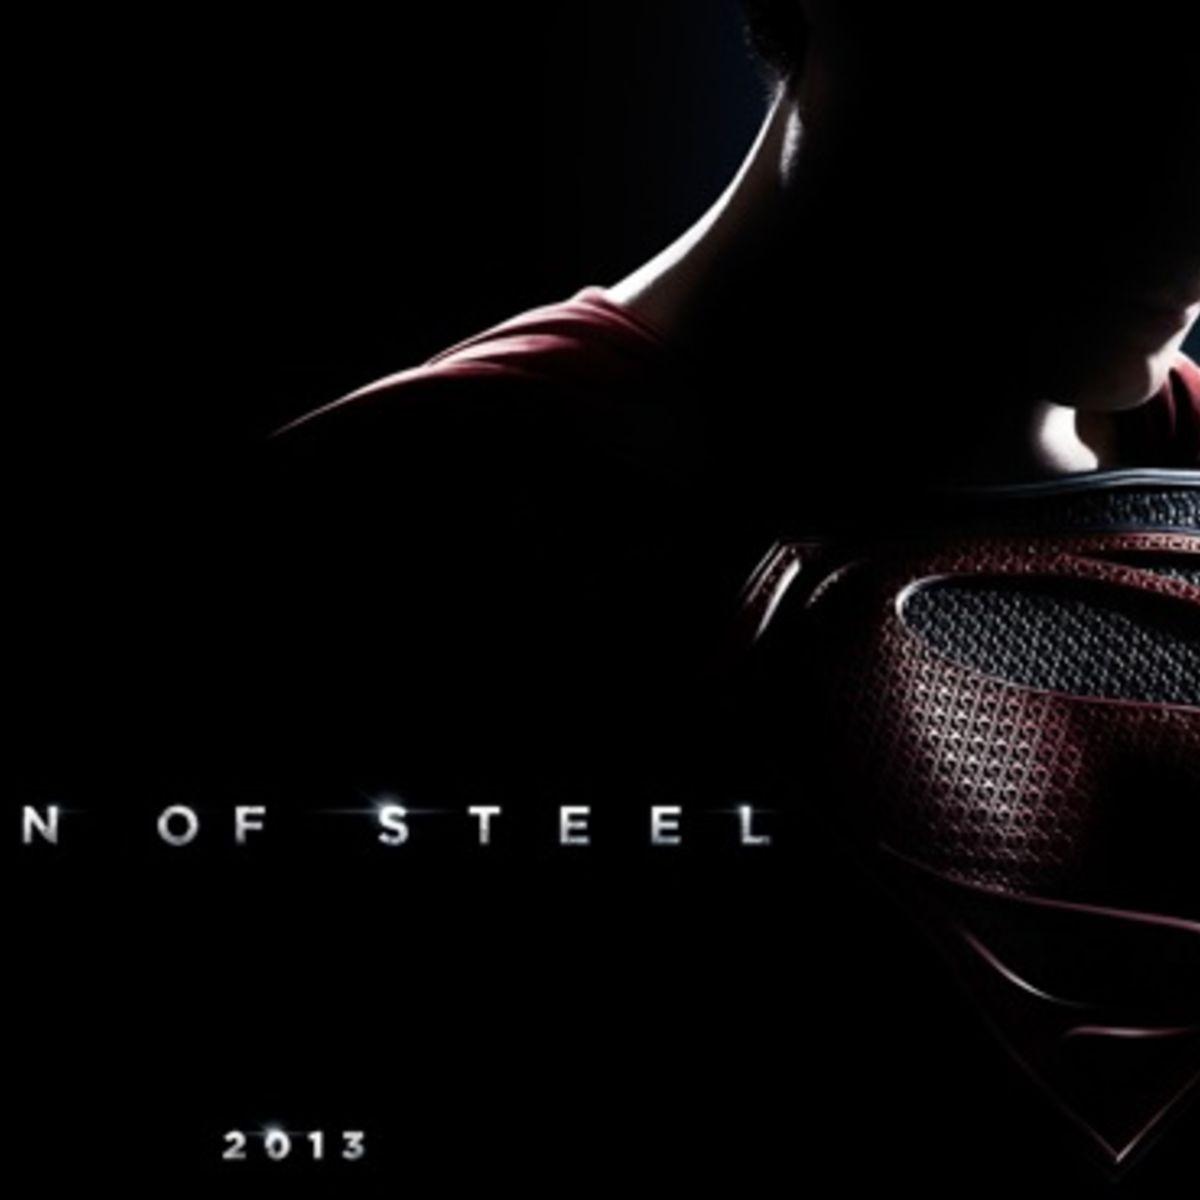 man_of_steel_one_sheet.jpg